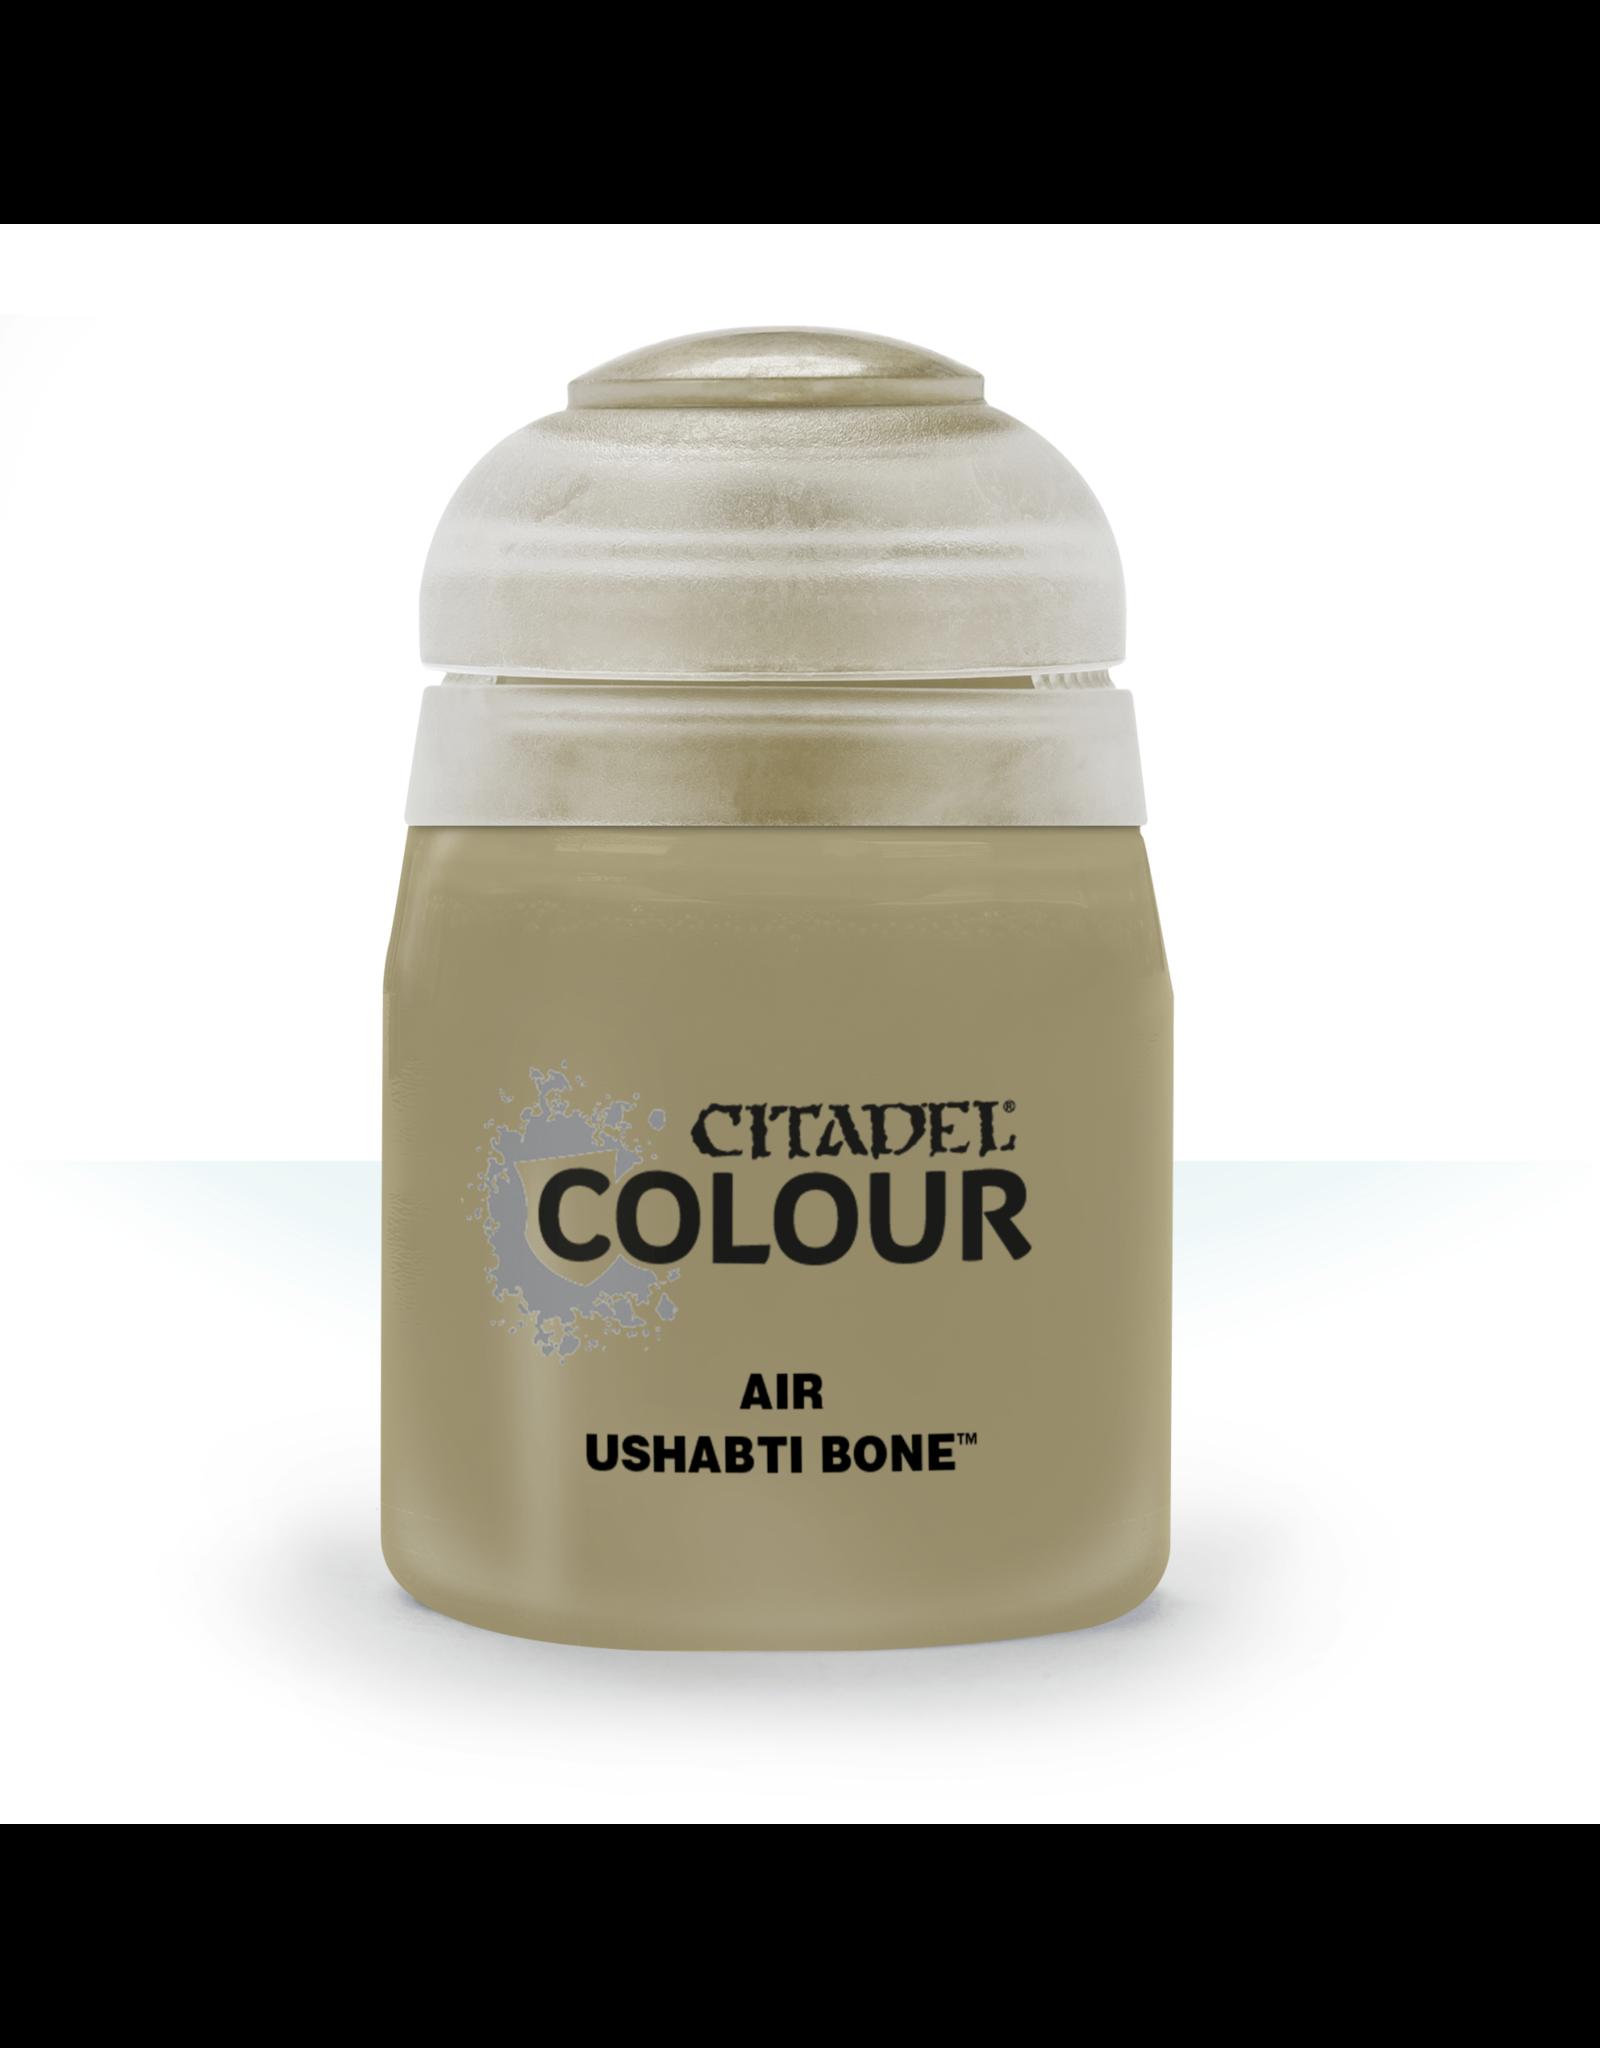 Citadel Citadel Paints Air Paint Ushabti Bone